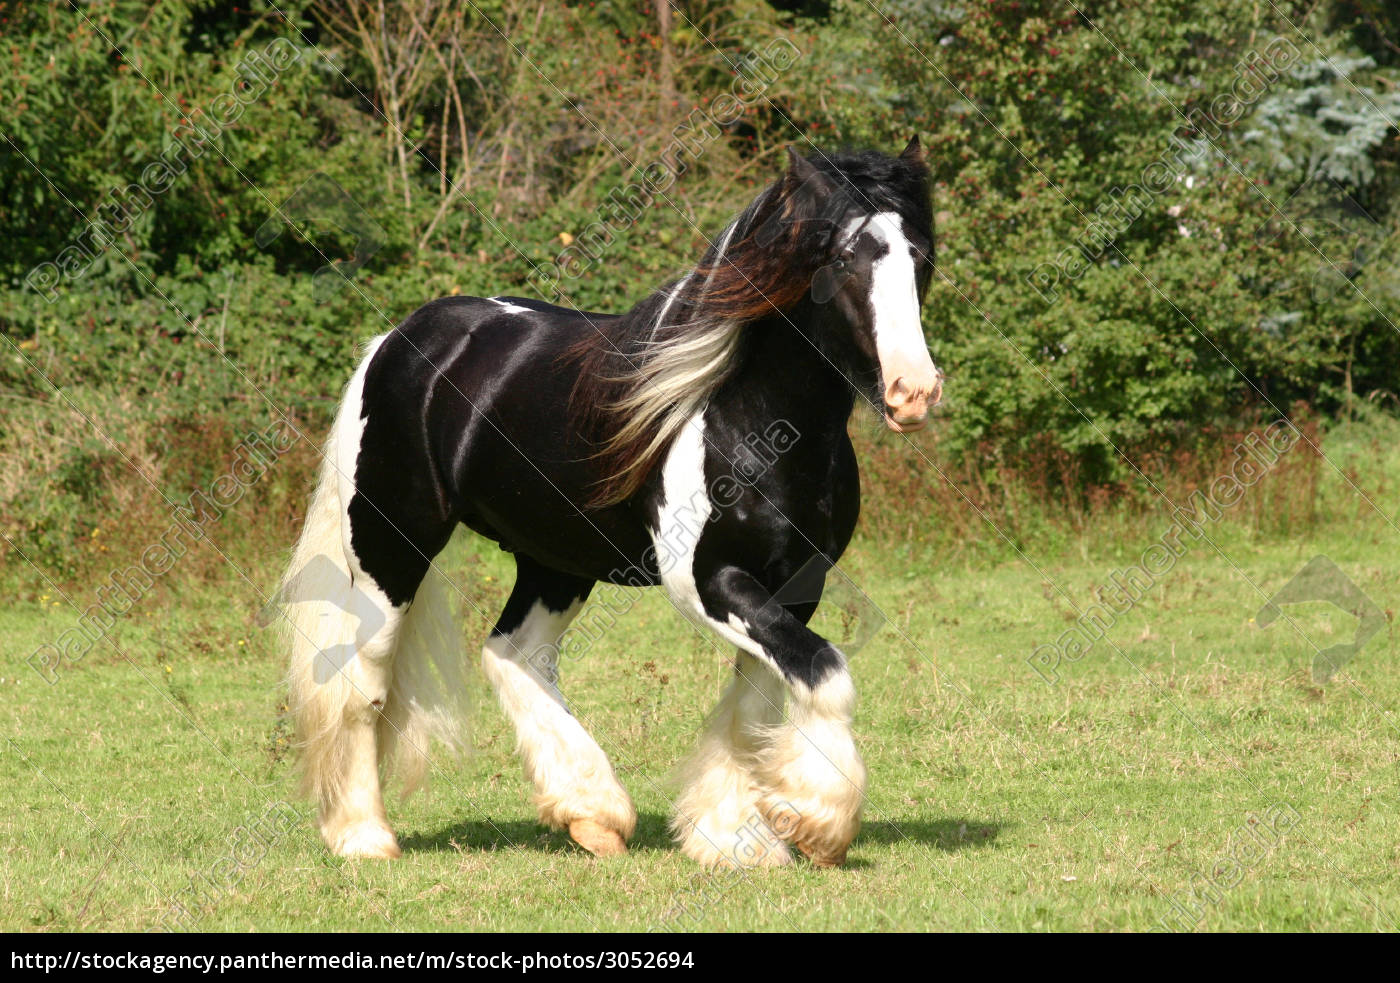 Stock image 3052694 - irish cob stallion tabt on pasture